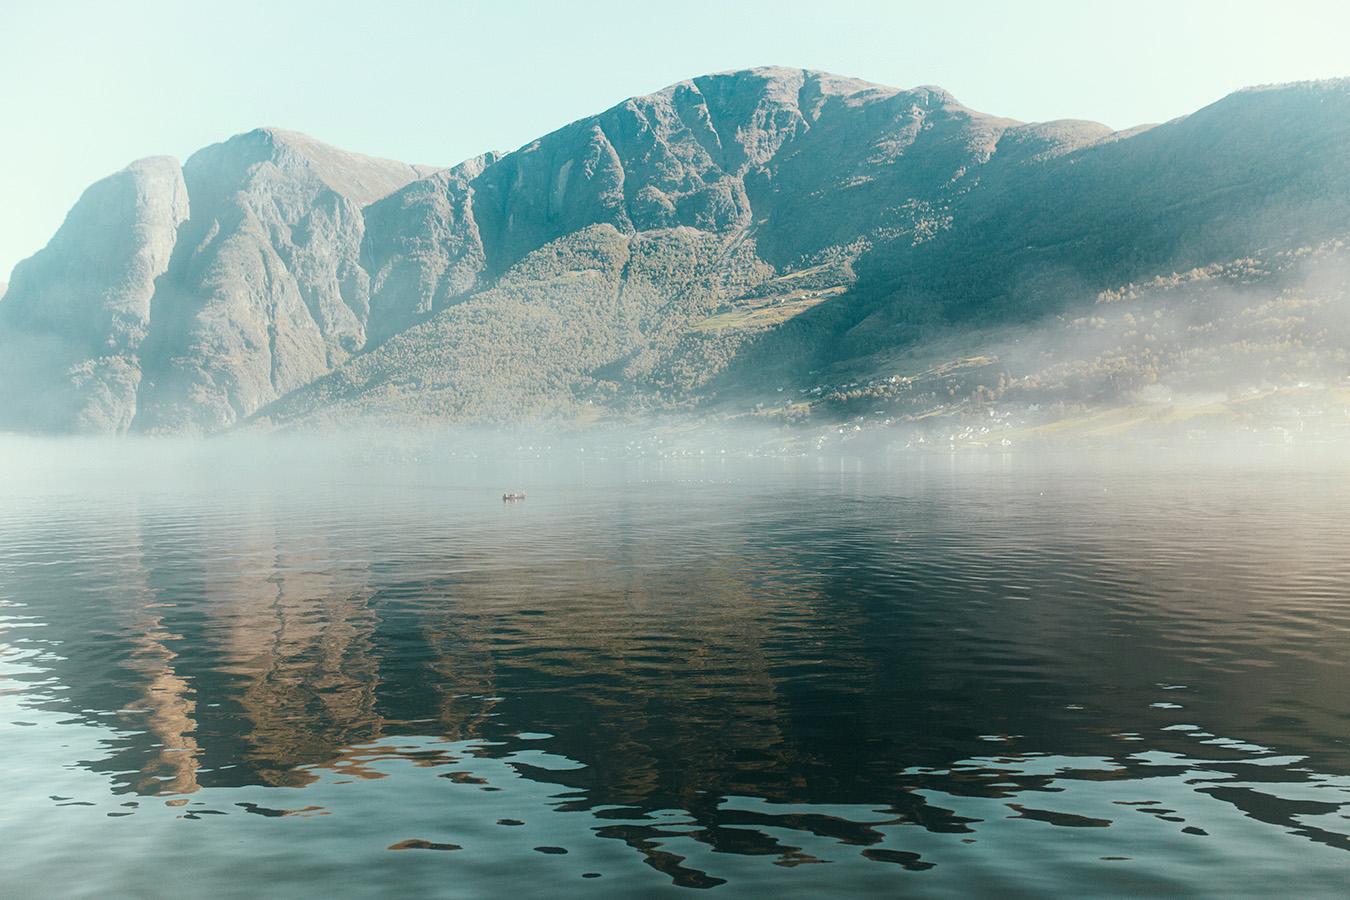 Aurland, Aurlandsfjord